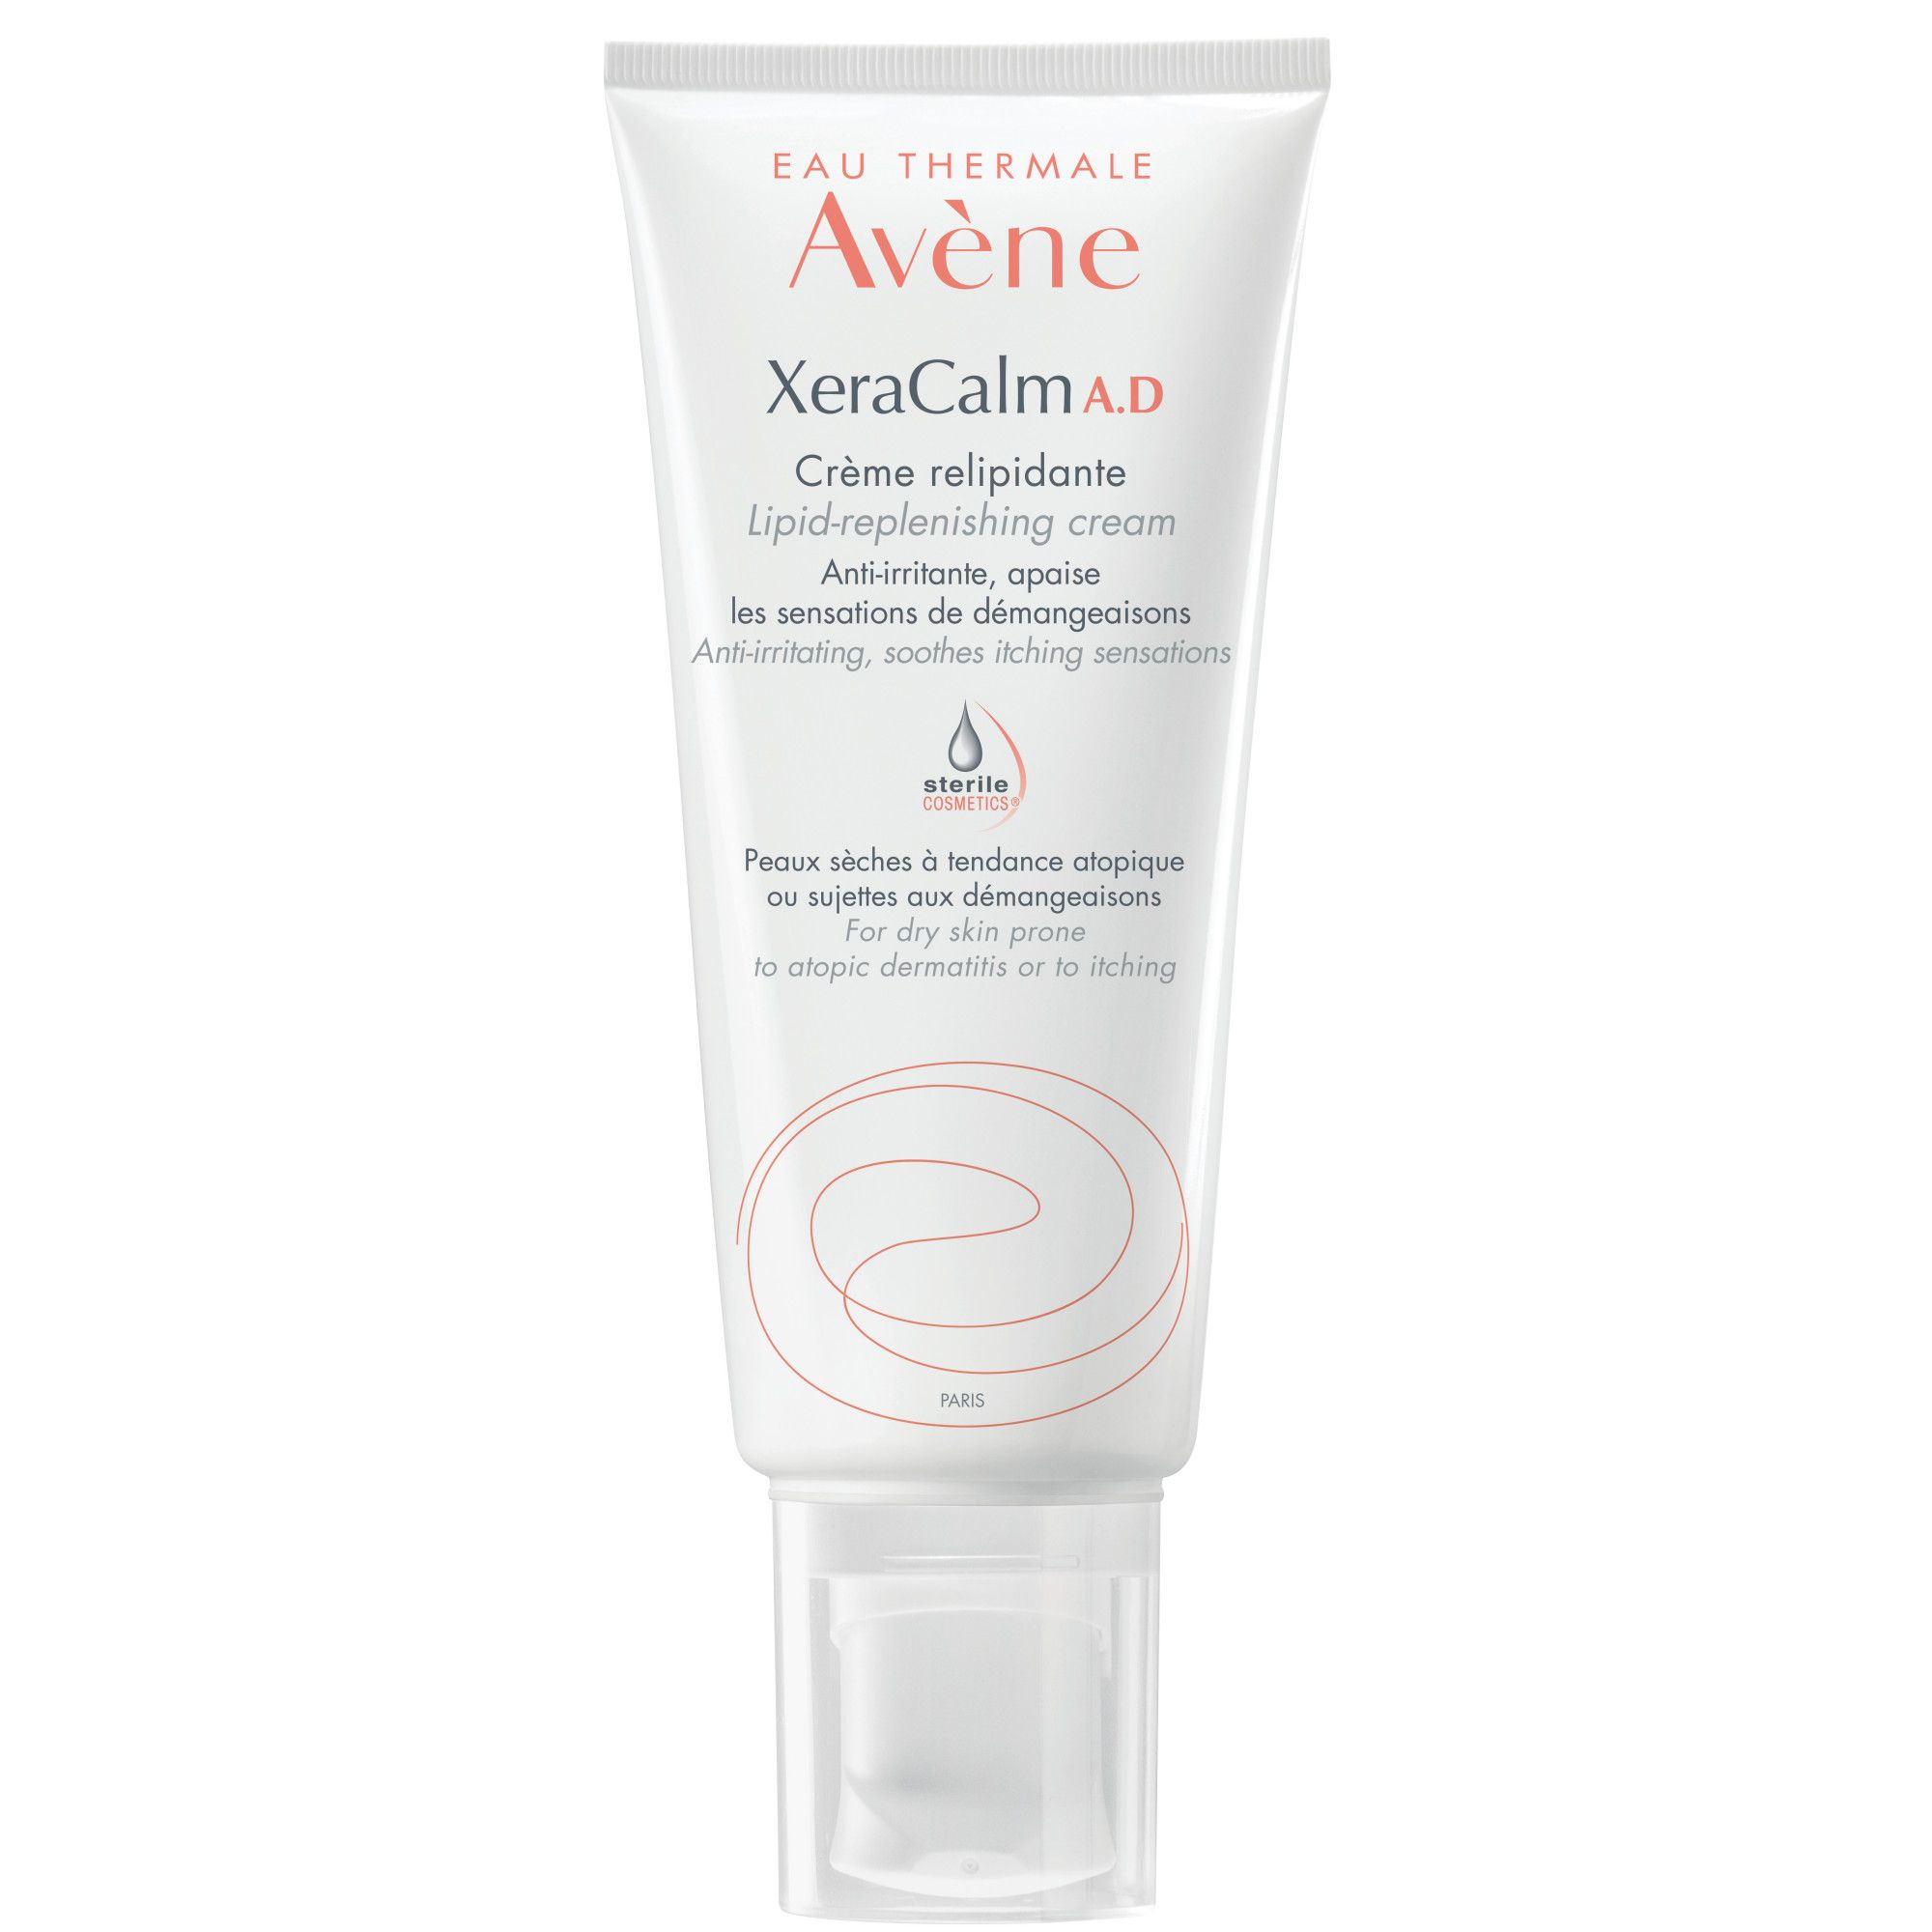 Crema pentru piele uscata si atopica XeraCalm A.D., 200 ml, Avene imagine produs 2021